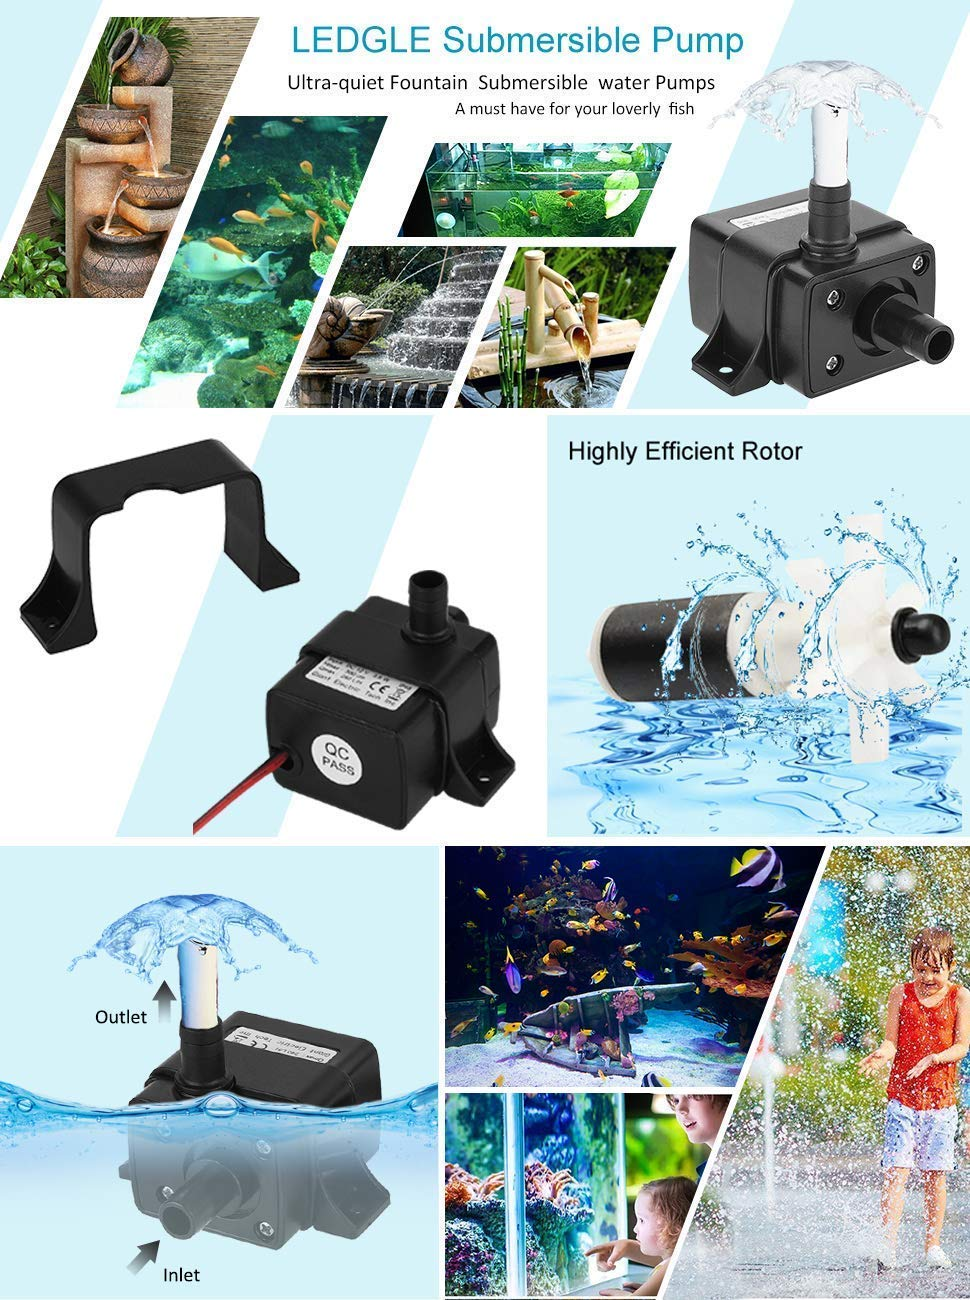 LEDGLE Submersible Pump Mini Electric Brushless Fountain Water Pumps  Ultra-Quiet, IP68 Waterproof, Dual-Purpose Design for Fish Tank,  Hydroponics,